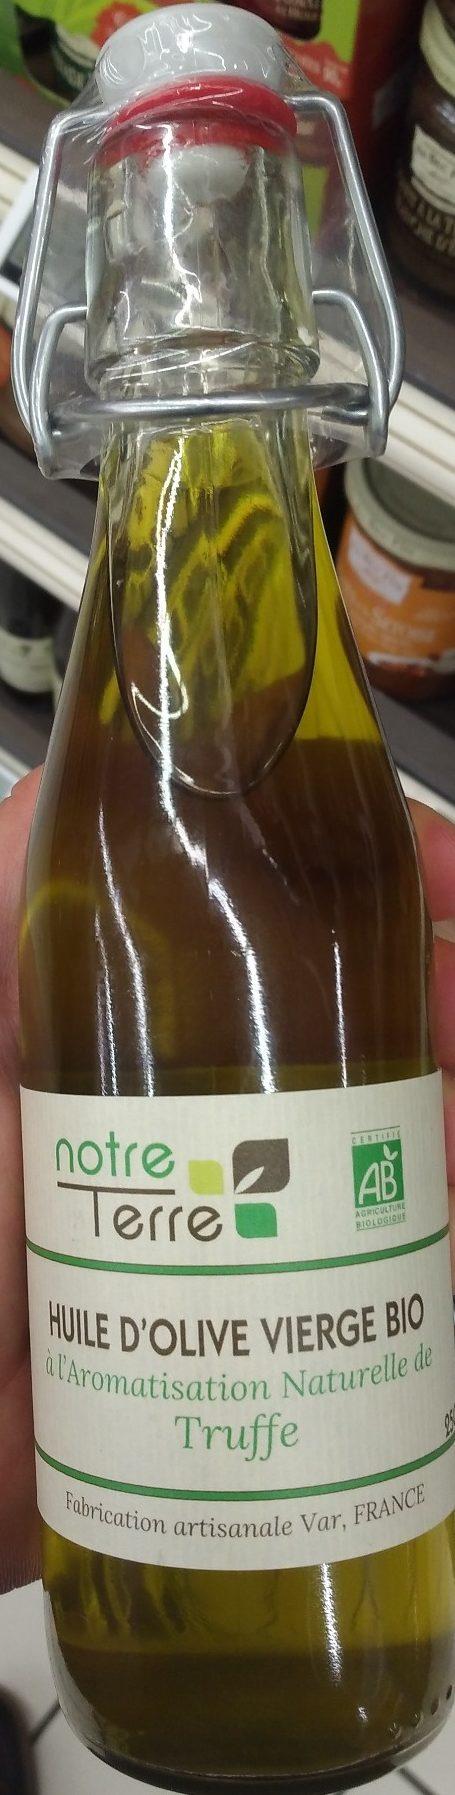 Huile d'Olive Vierge Bio Aromatisation Naturelle de Truffe - Produkt - fr